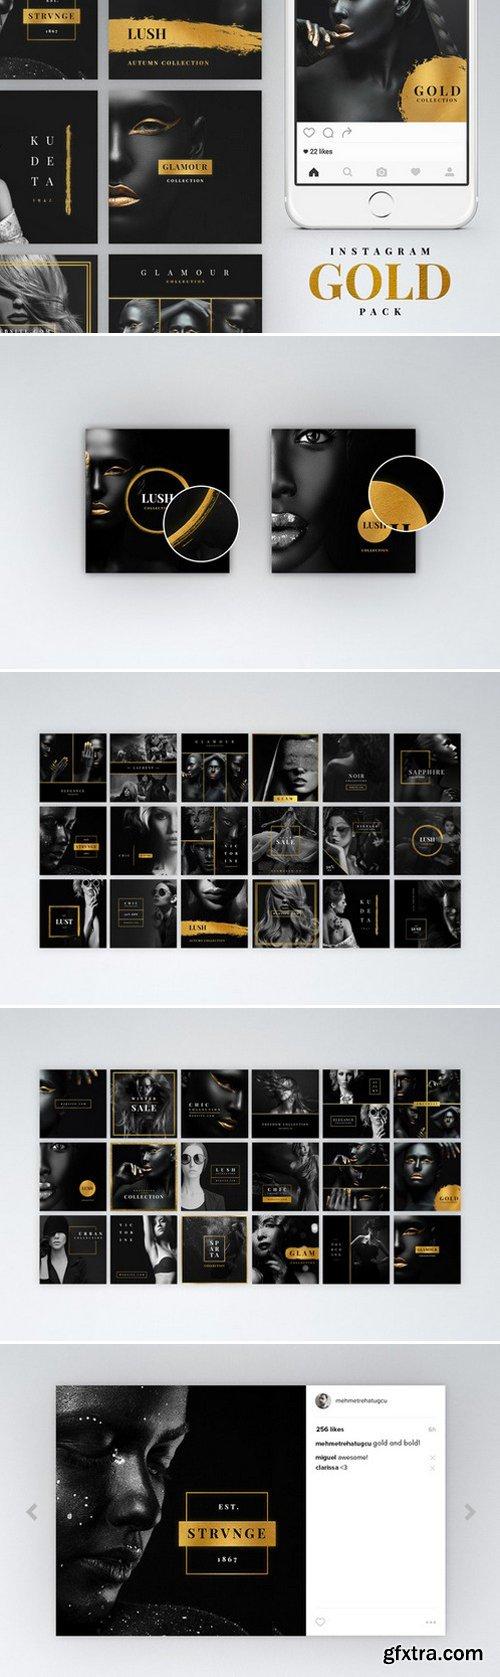 CM - Instagram Gold Pack 1061748